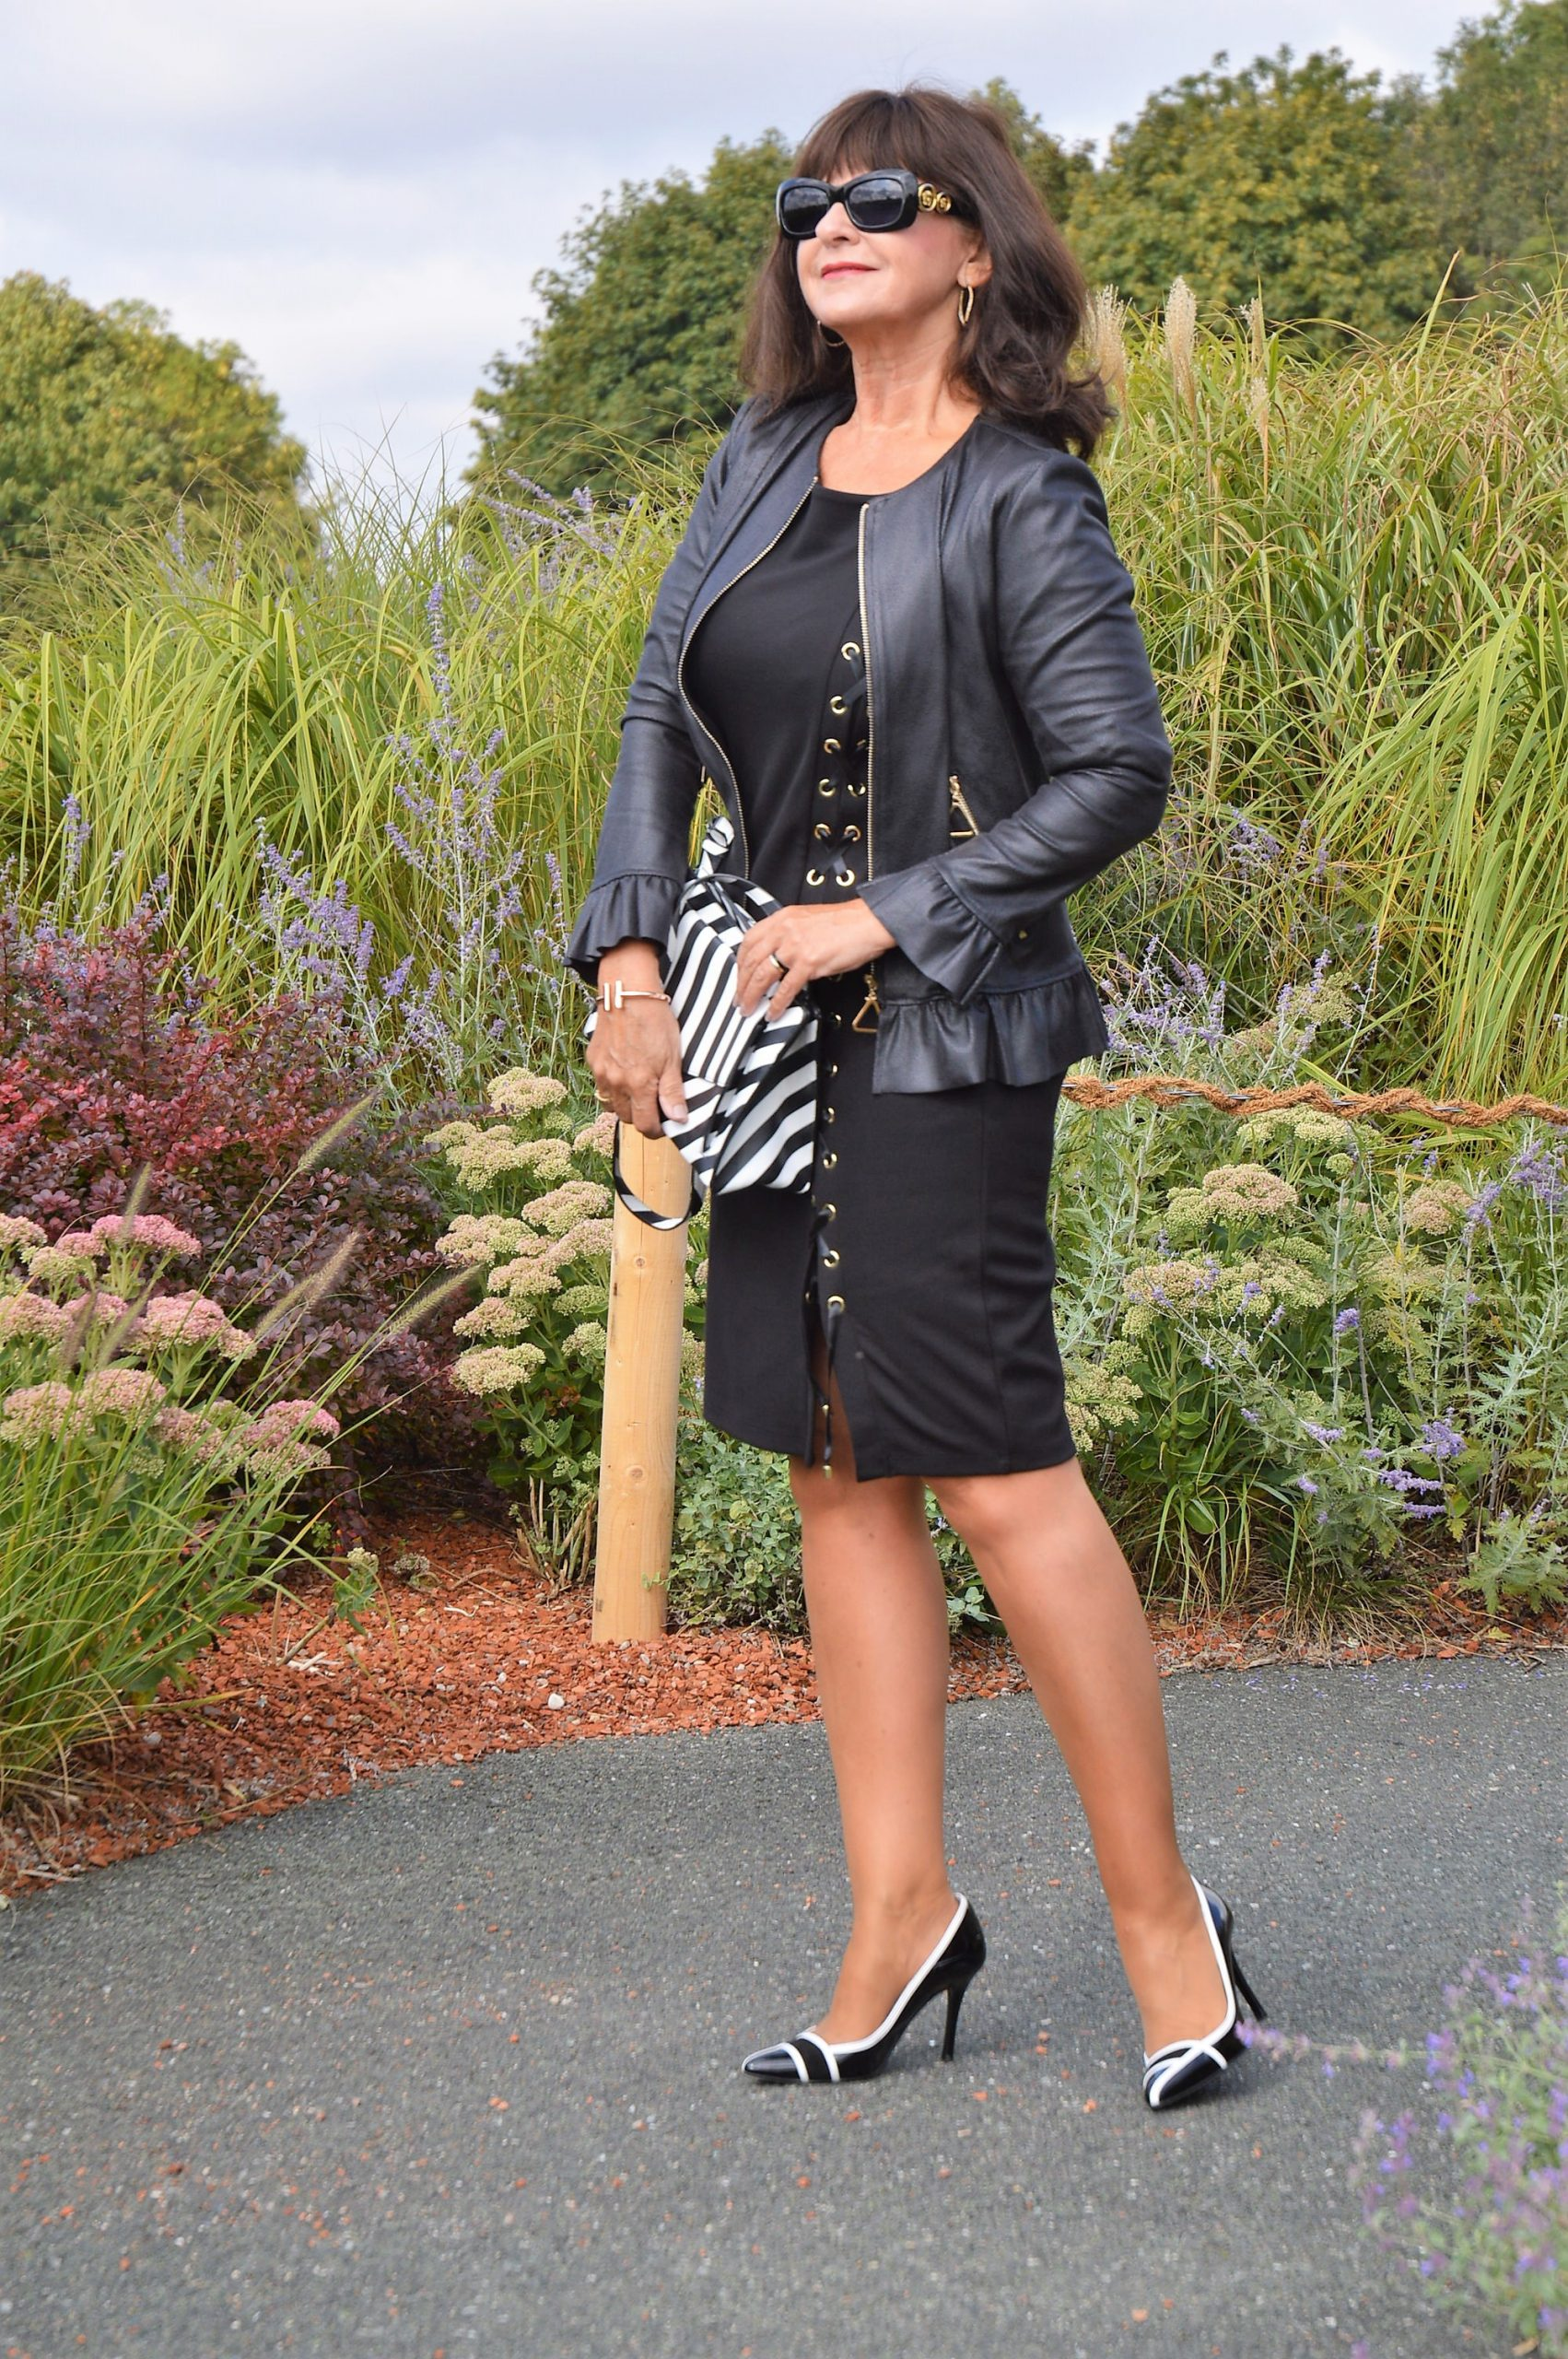 Martina Berg  Lady 50Plus  Fashion  Lifestyle Blog Für